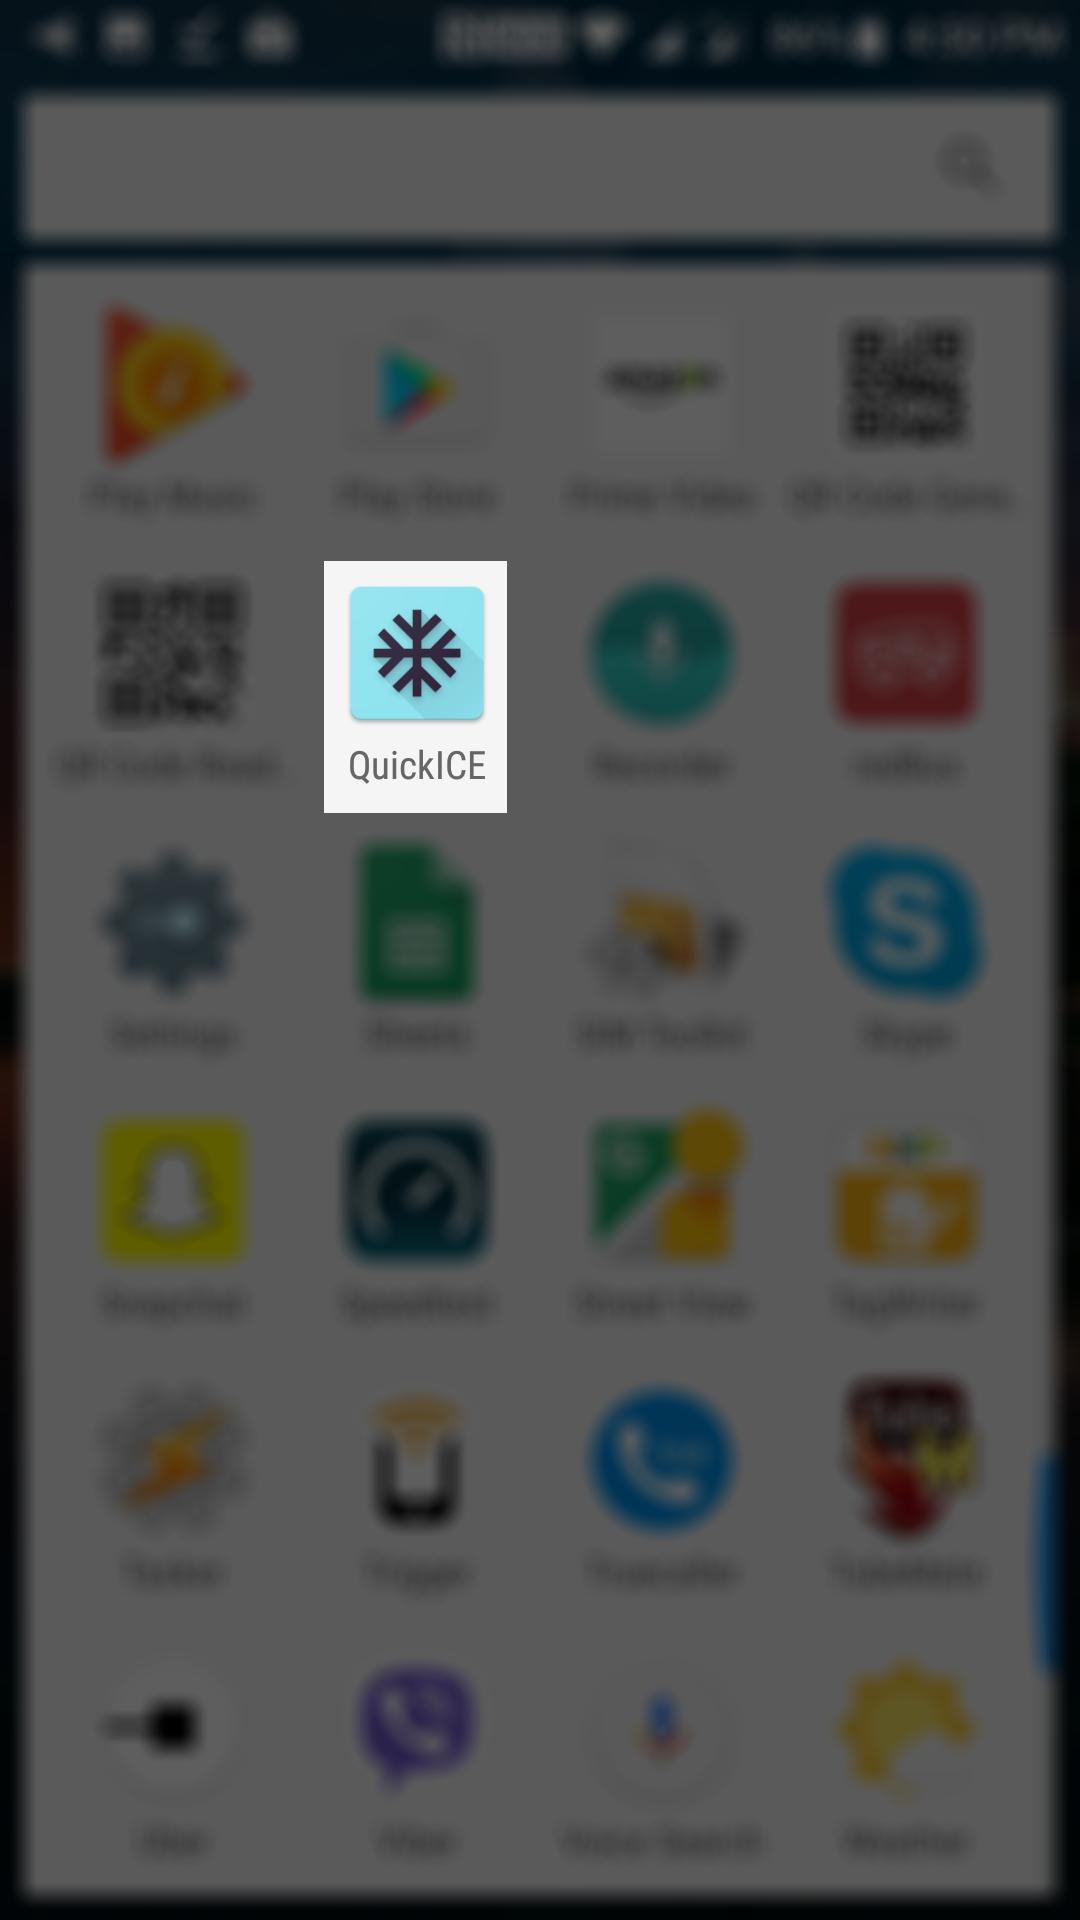 quickice-open